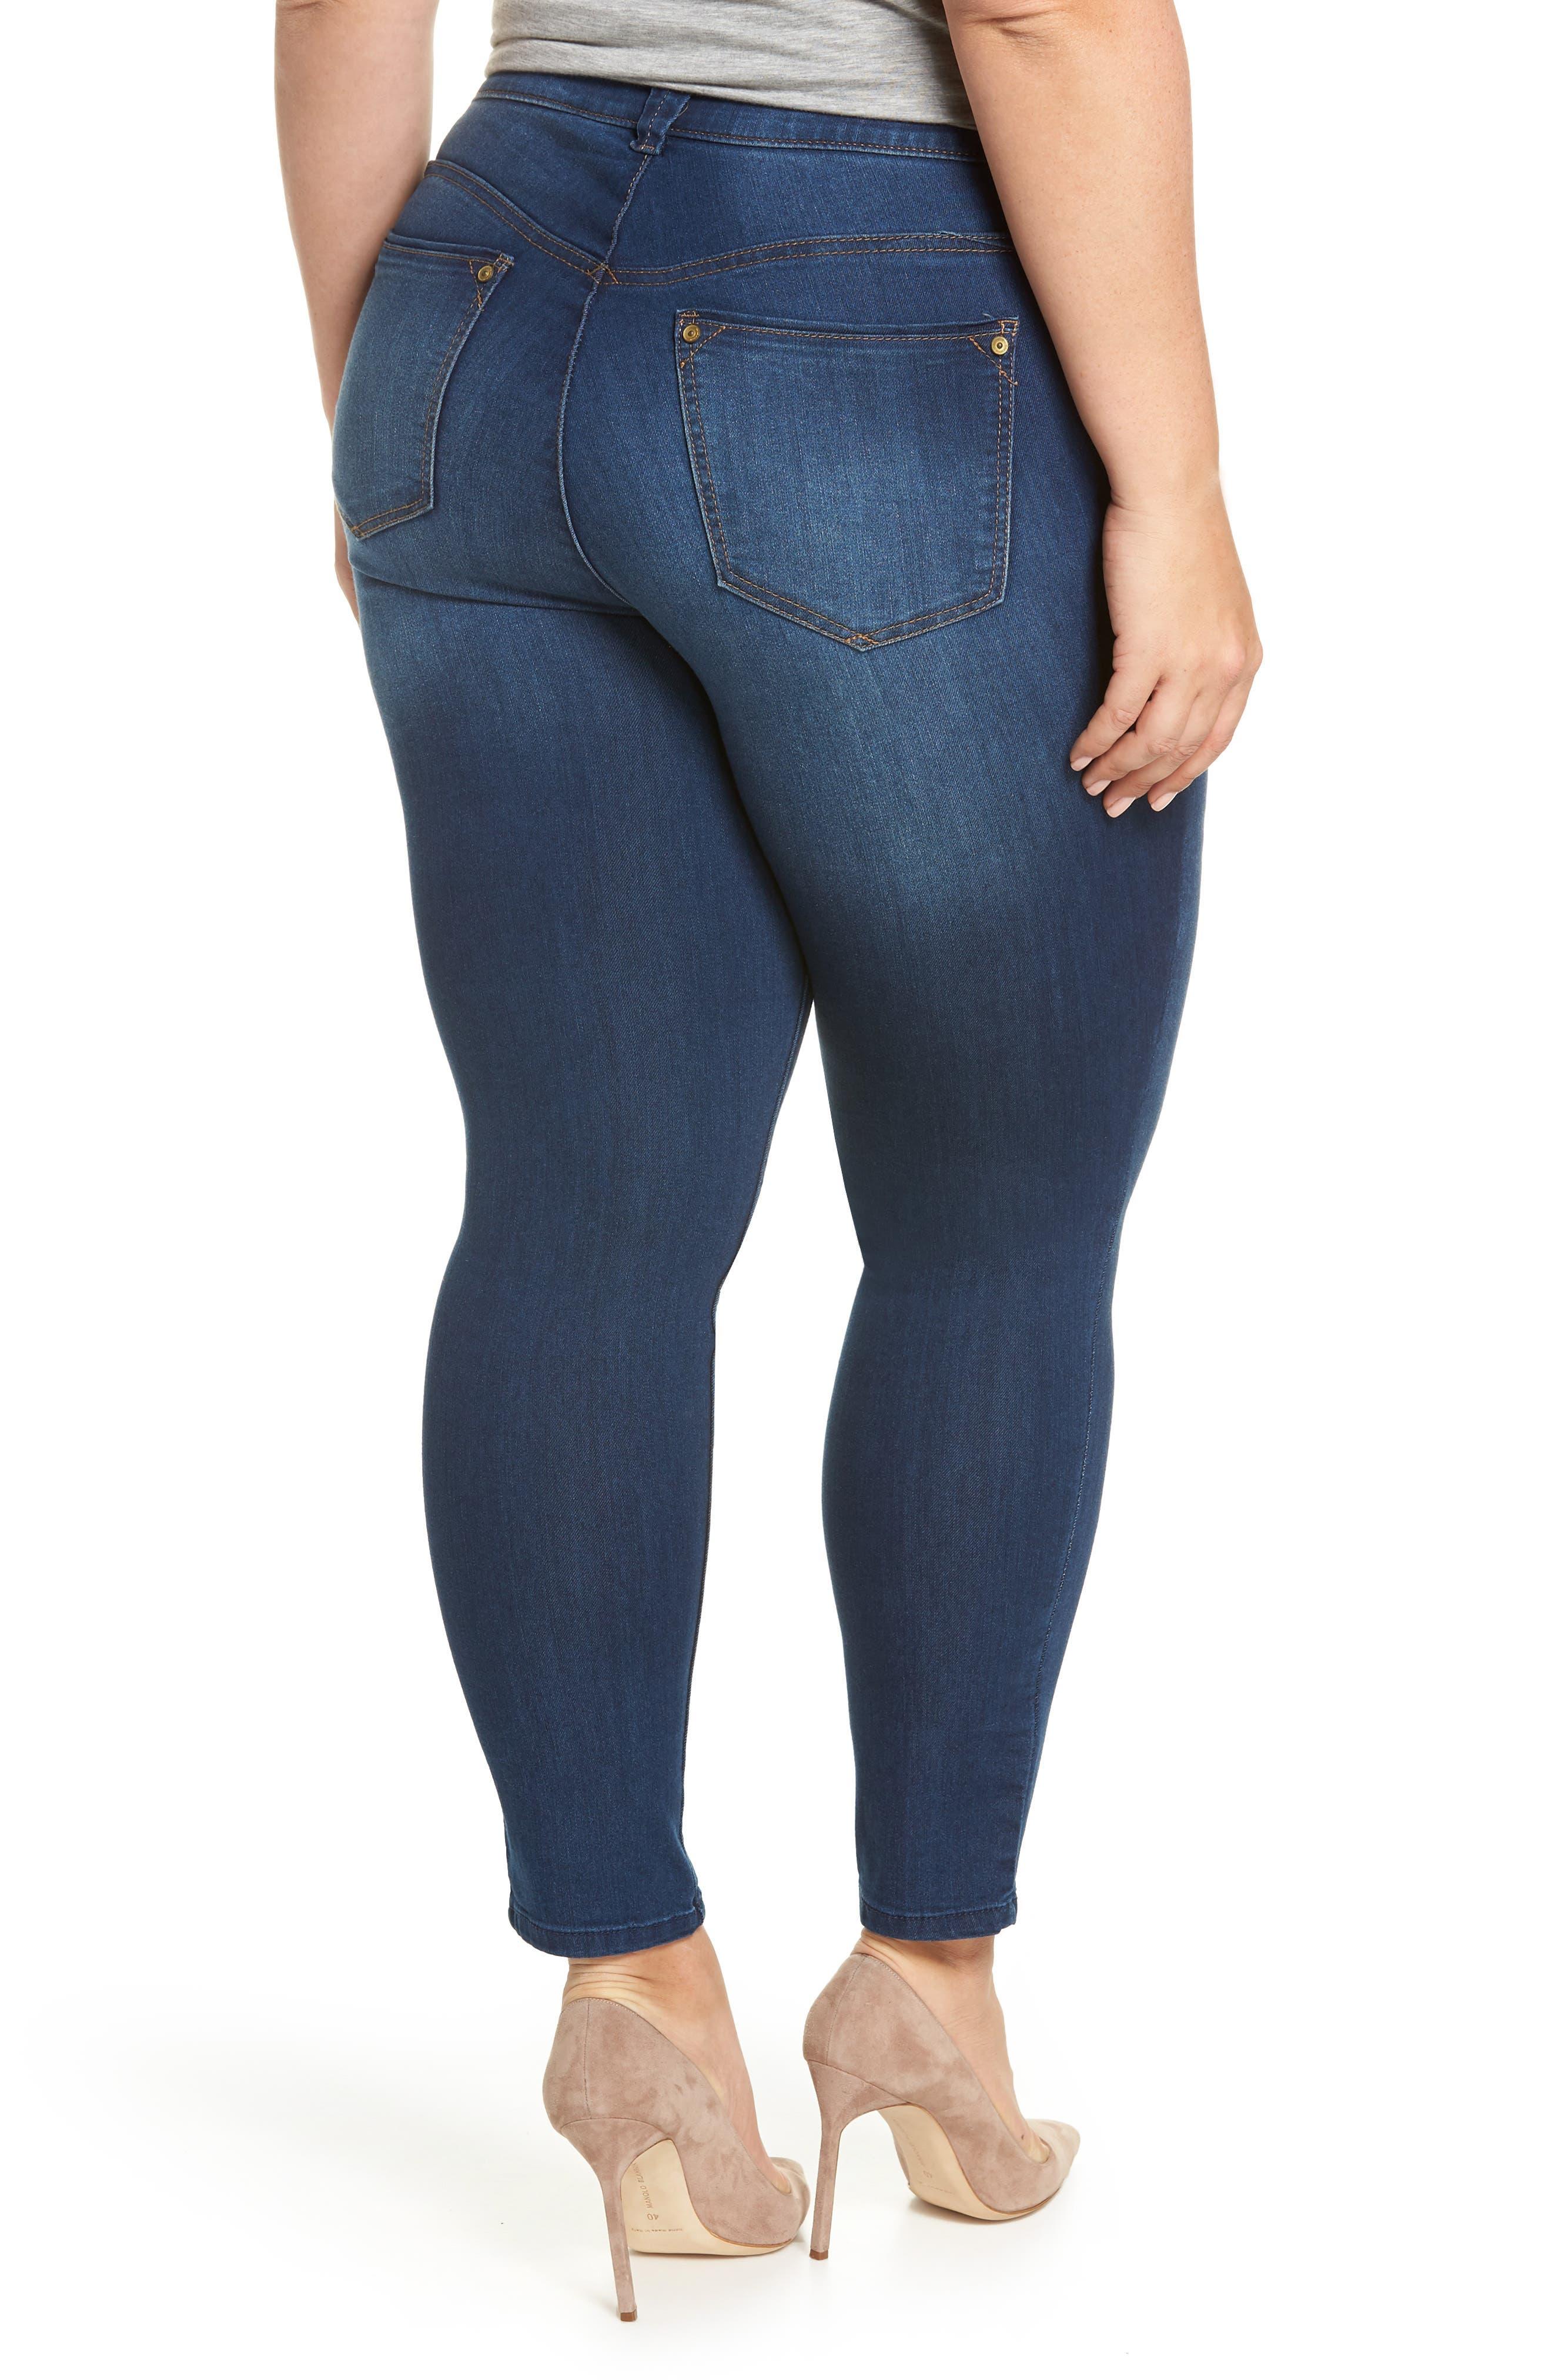 Ab-solution Ankle Skimmer Jeans,                             Alternate thumbnail 2, color,                             Blue